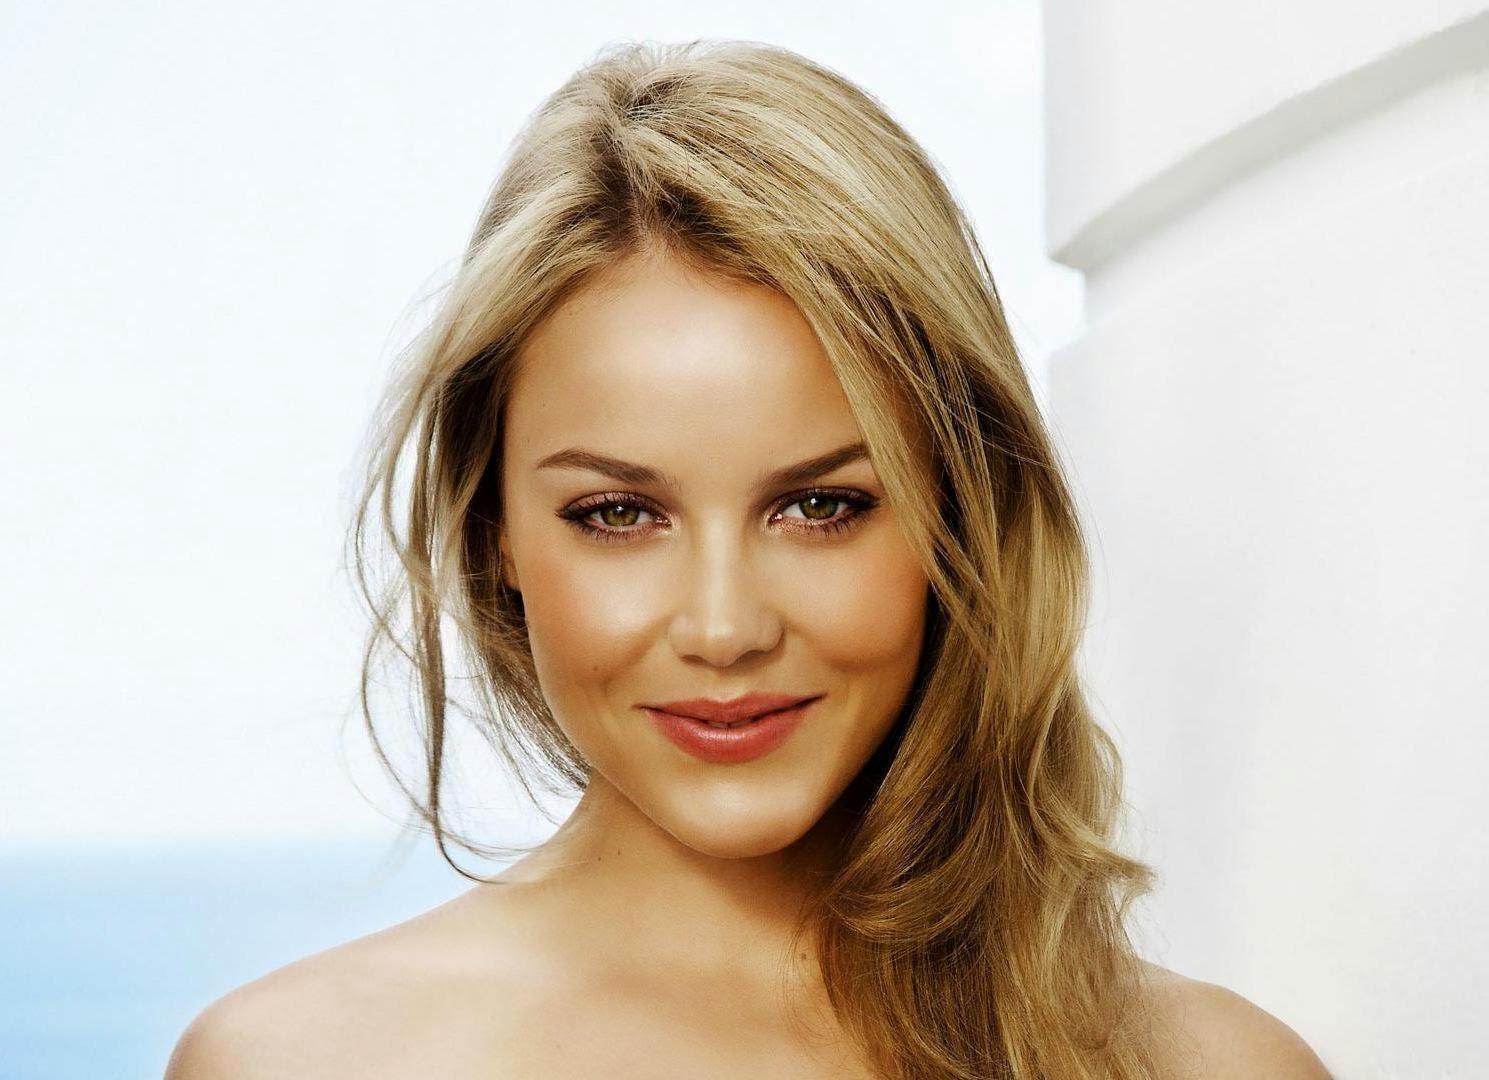 Hollywood actress wallpaper abbie cornish hd wallpapers - Hollywood desktop wallpapers actresses ...